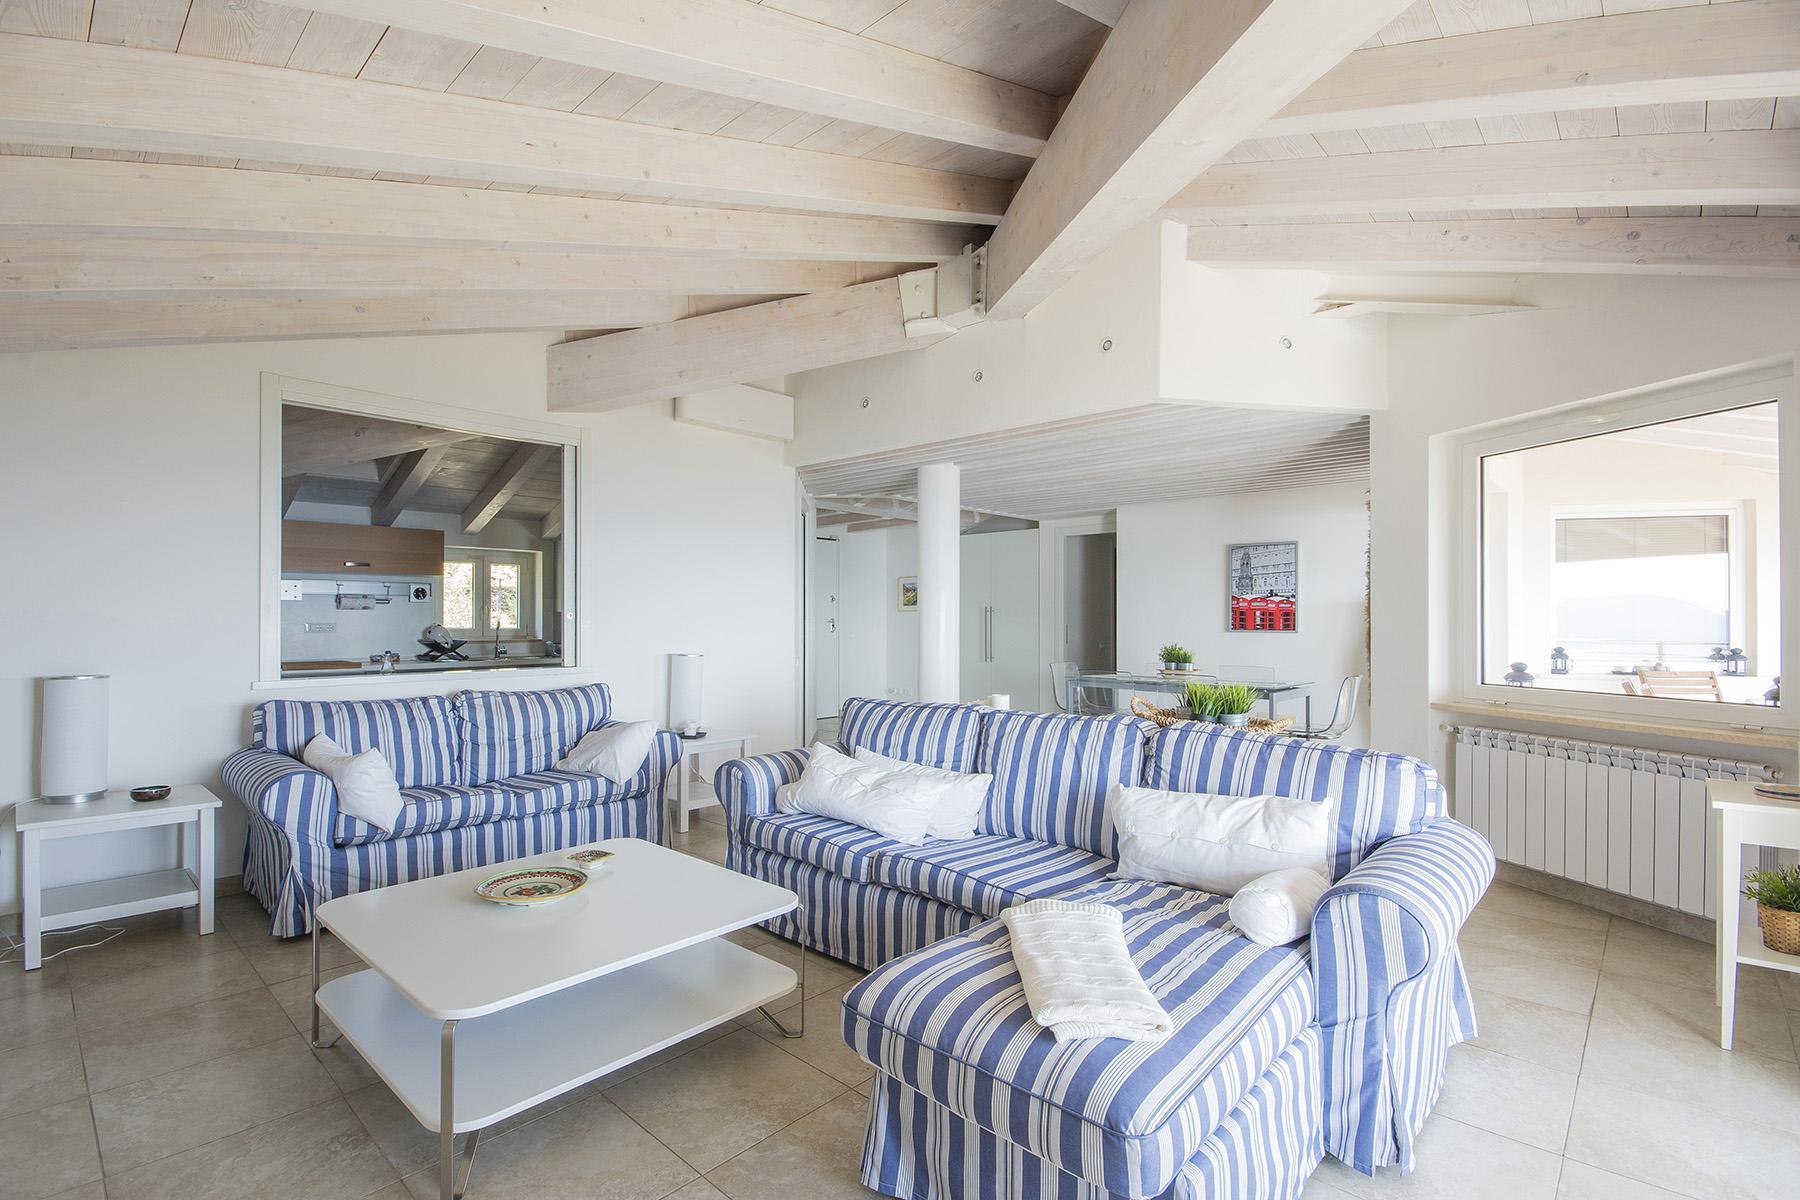 Villa in Vendita a Lerici: 5 locali, 580 mq - Foto 21